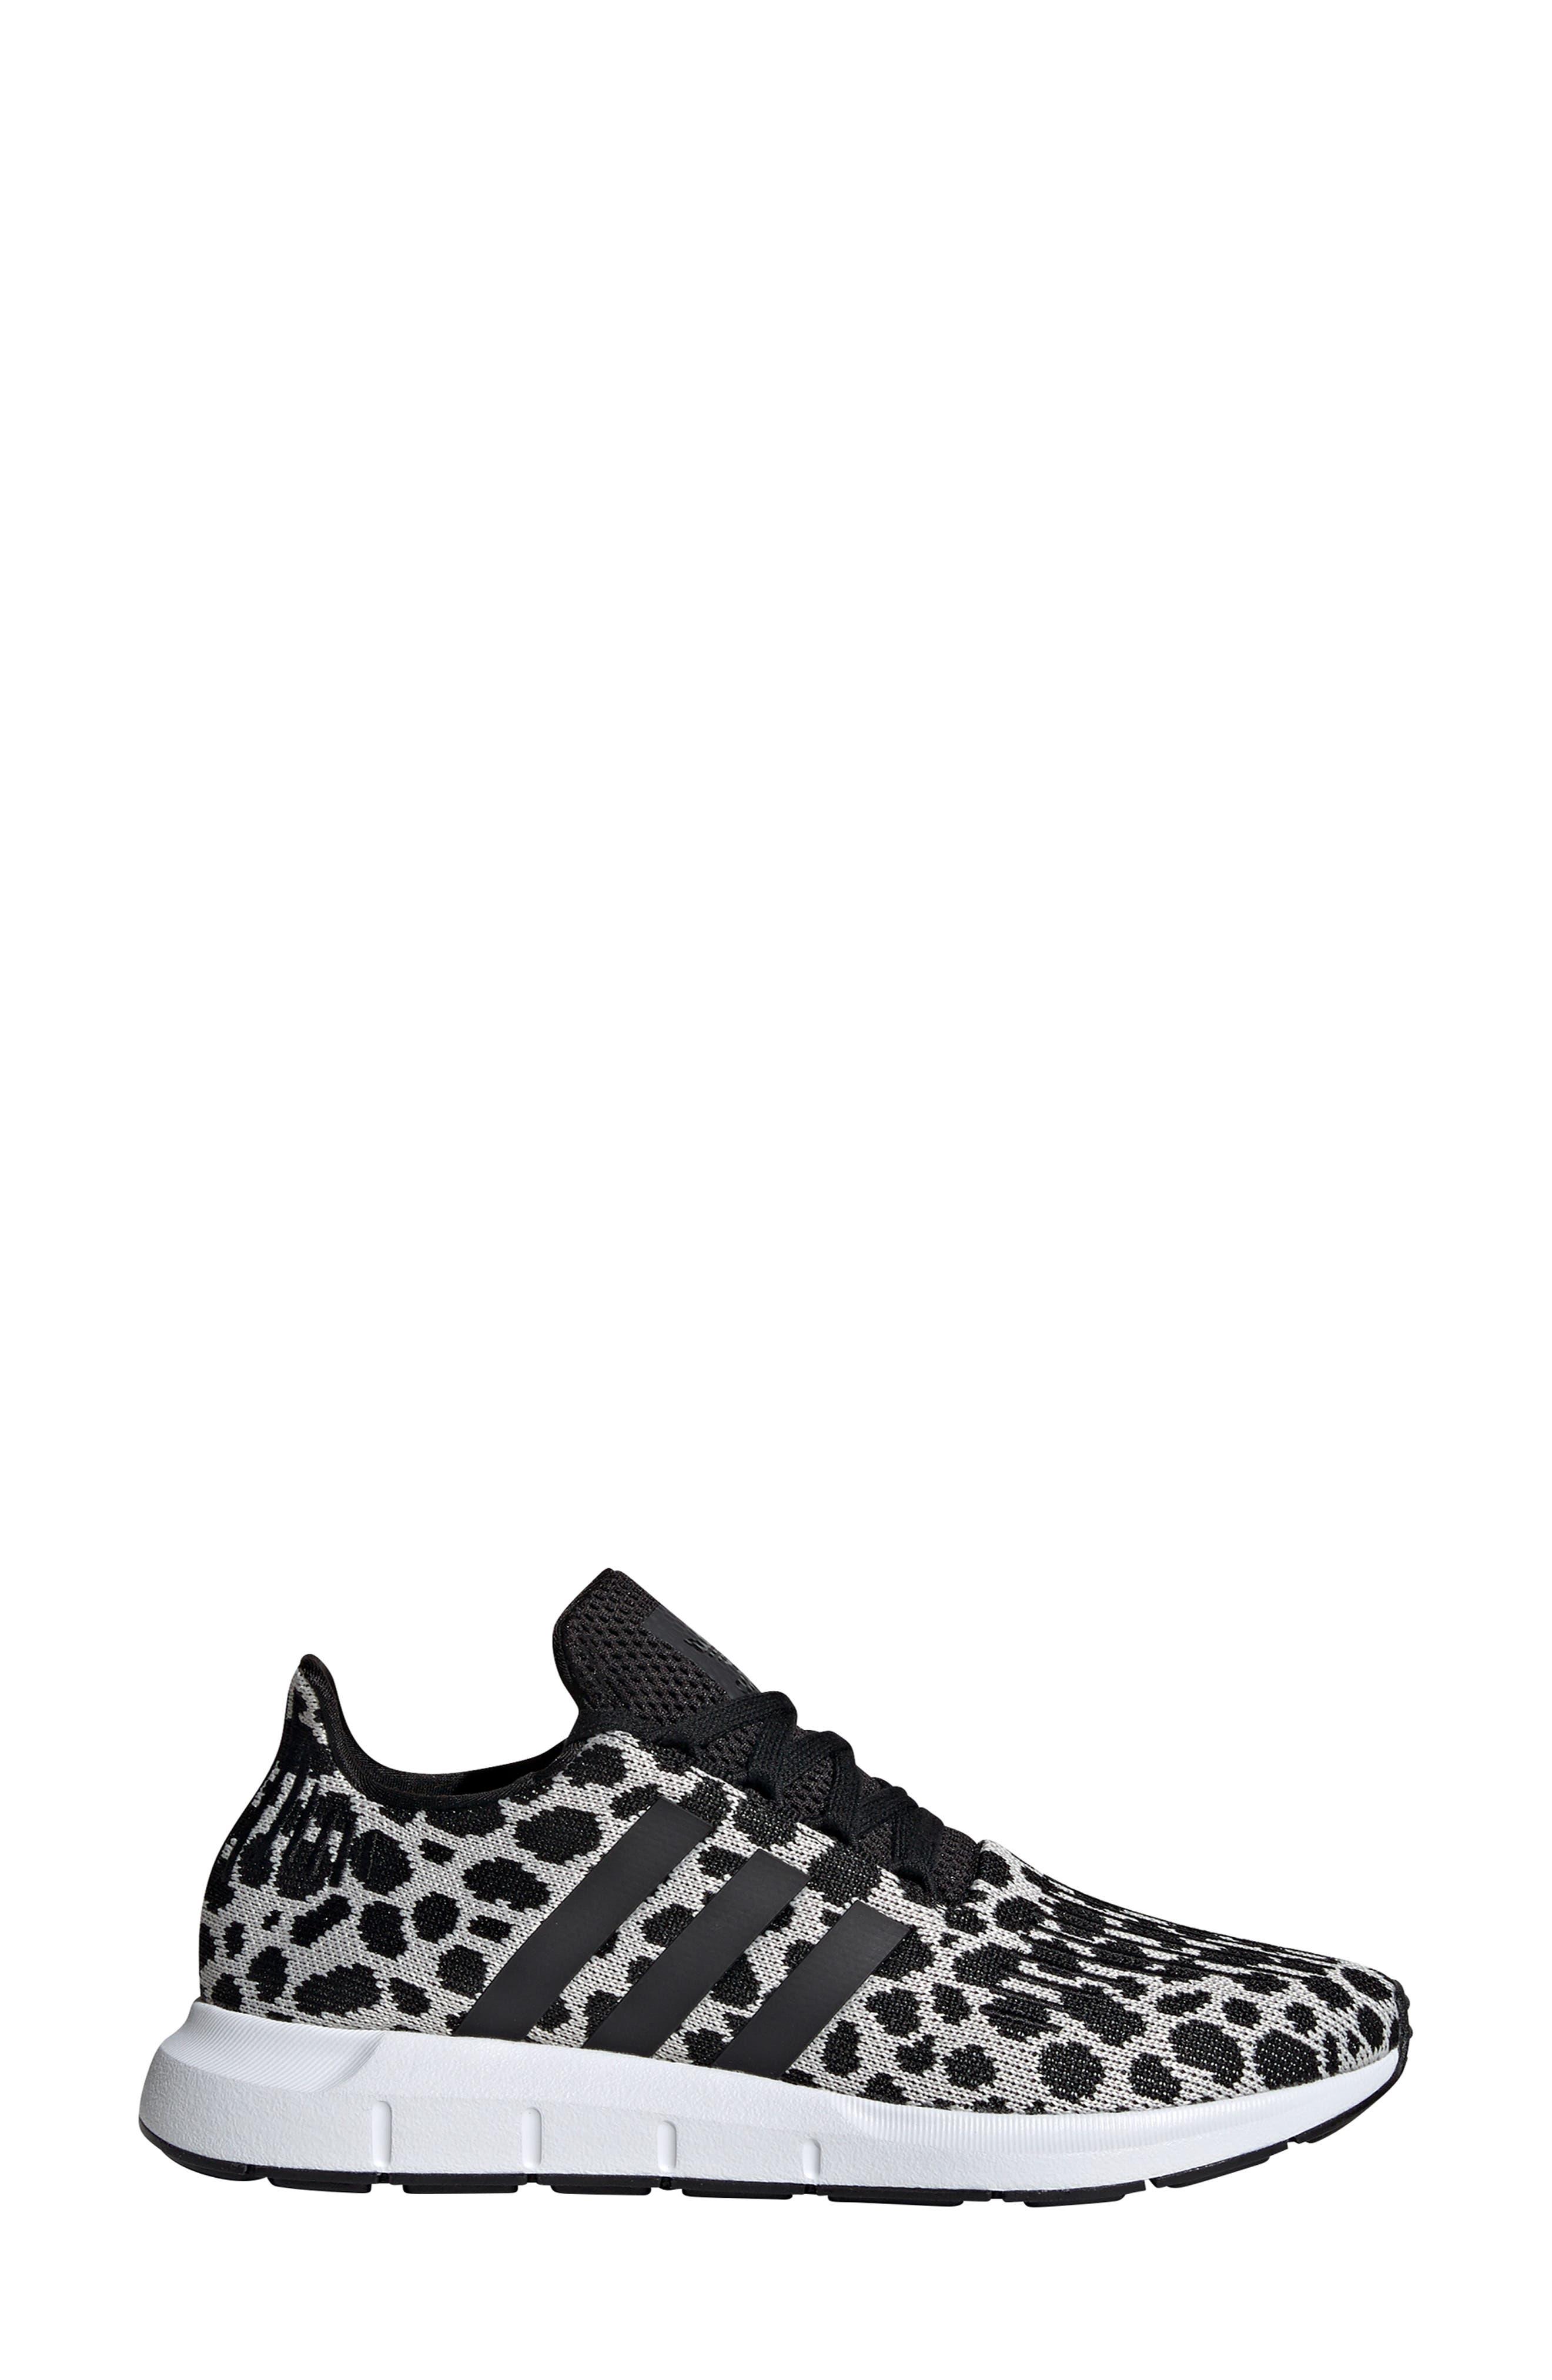 adidas swift run bd7962